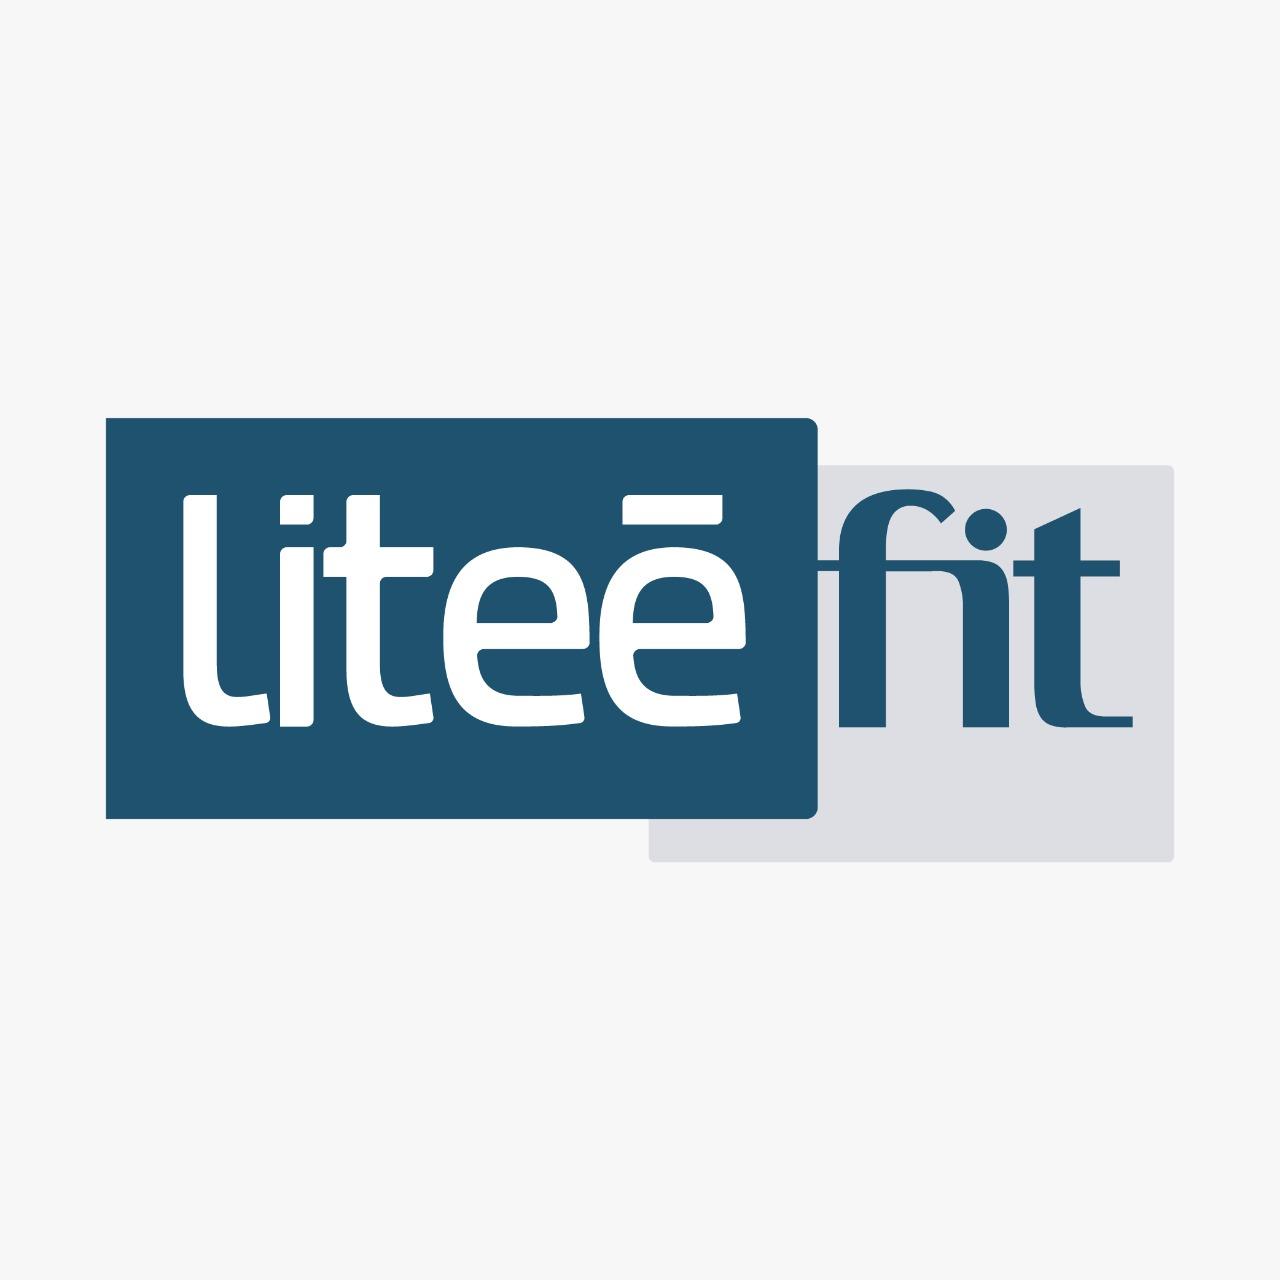 https://www.lojalitee.com.br/loja/busca.php?loja=714546&palavra_busca=liteefit